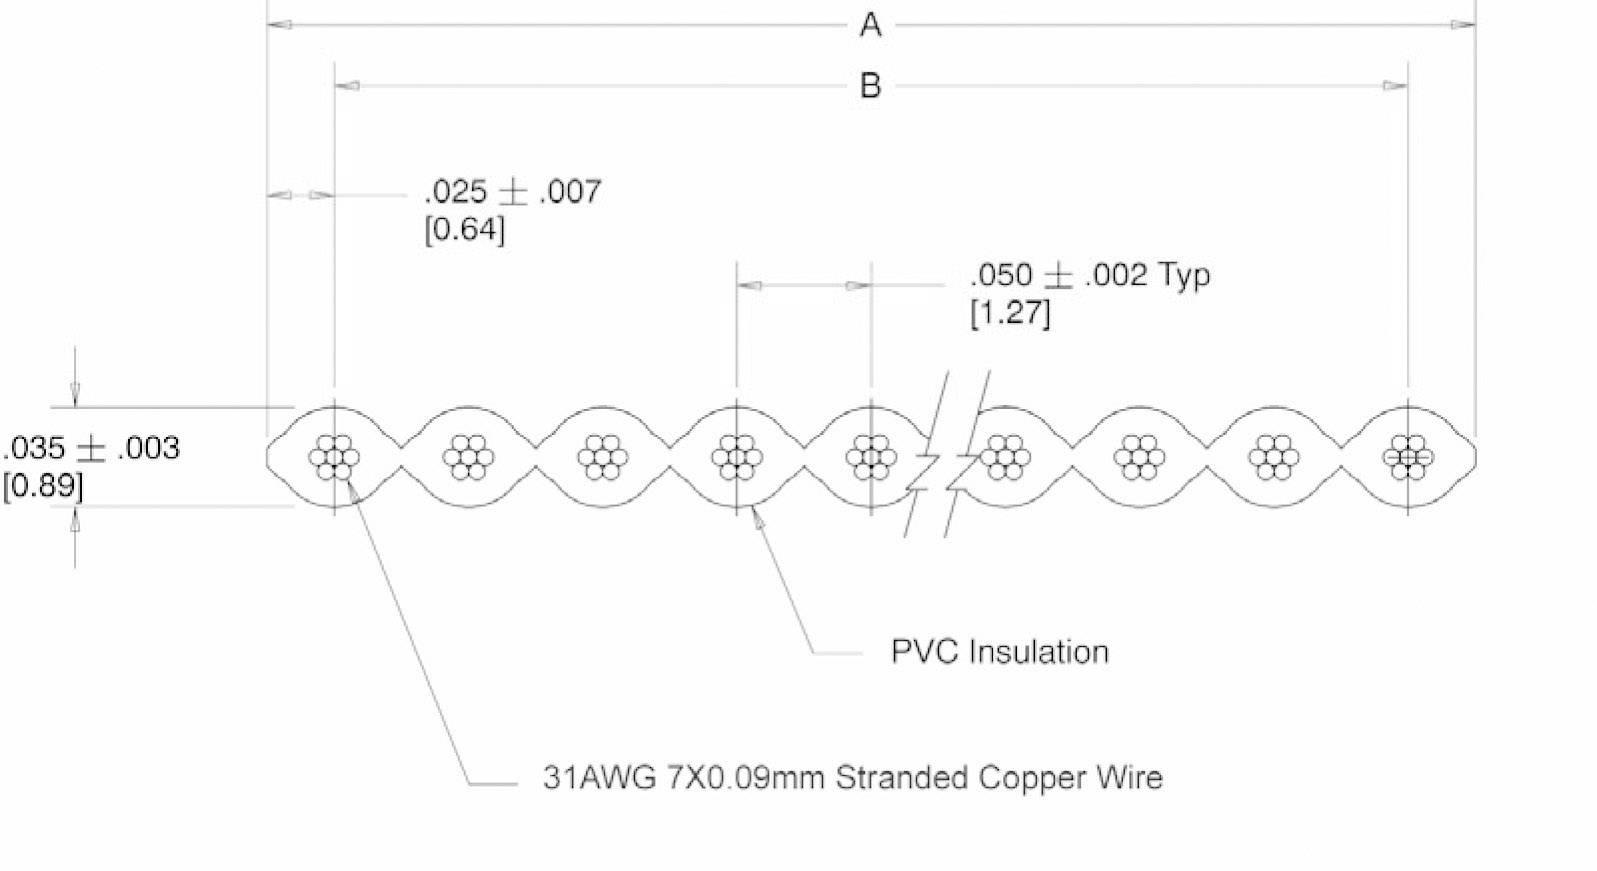 Plochý kabel Flachband cable 26P (SH1998C204), nestíněný, 30.5 m, šedá